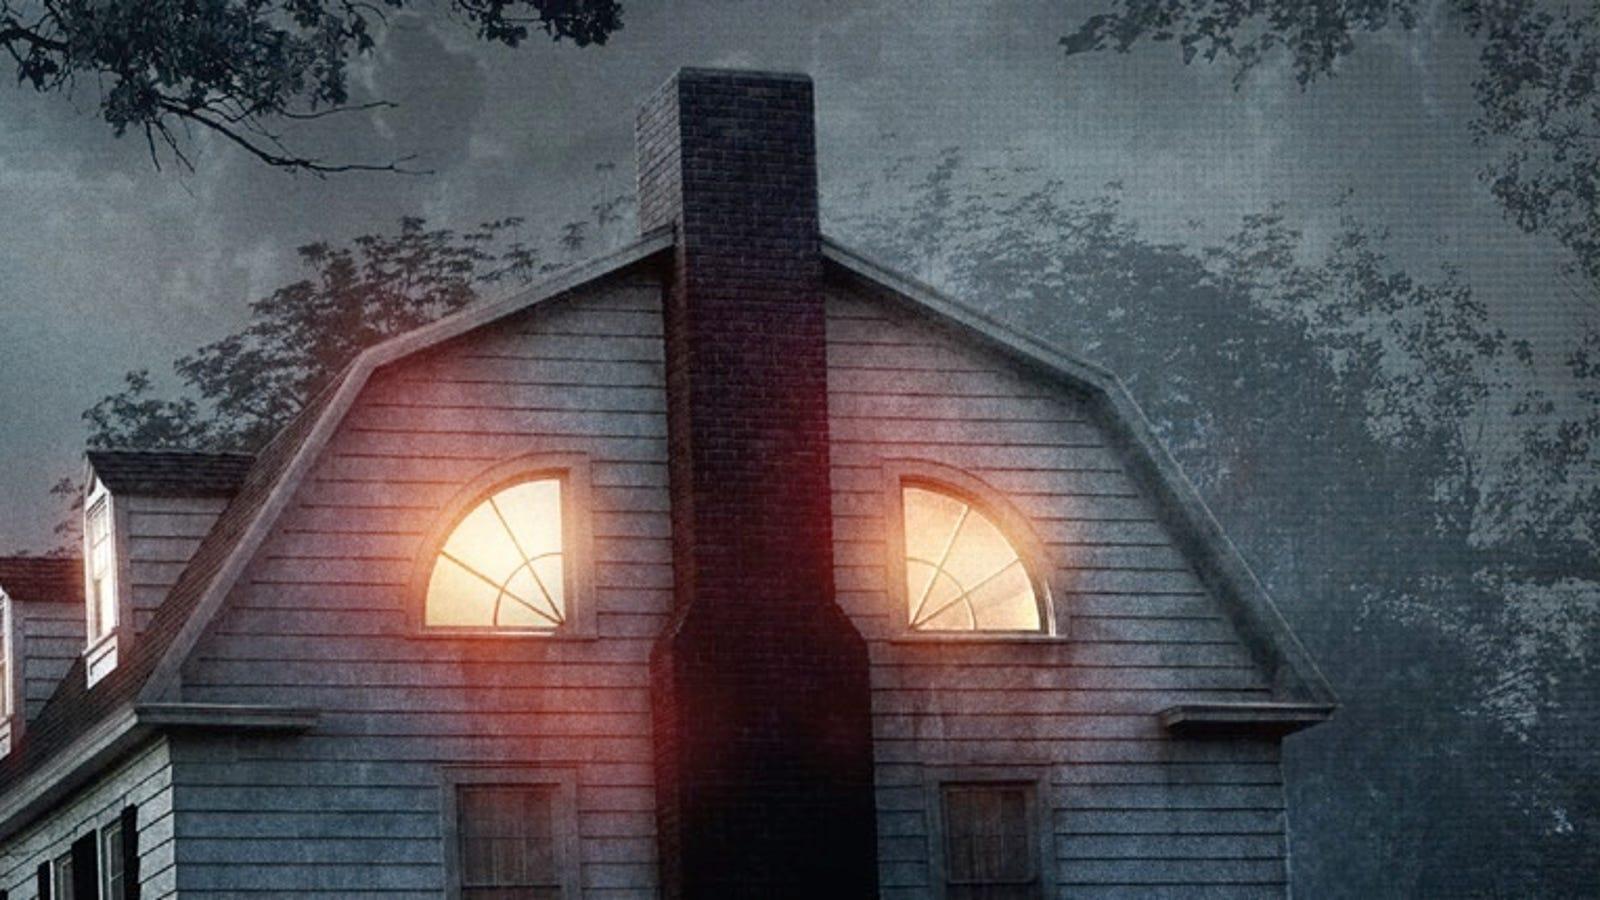 The New Amityville Horror Movie Poster Conveys Terror Via